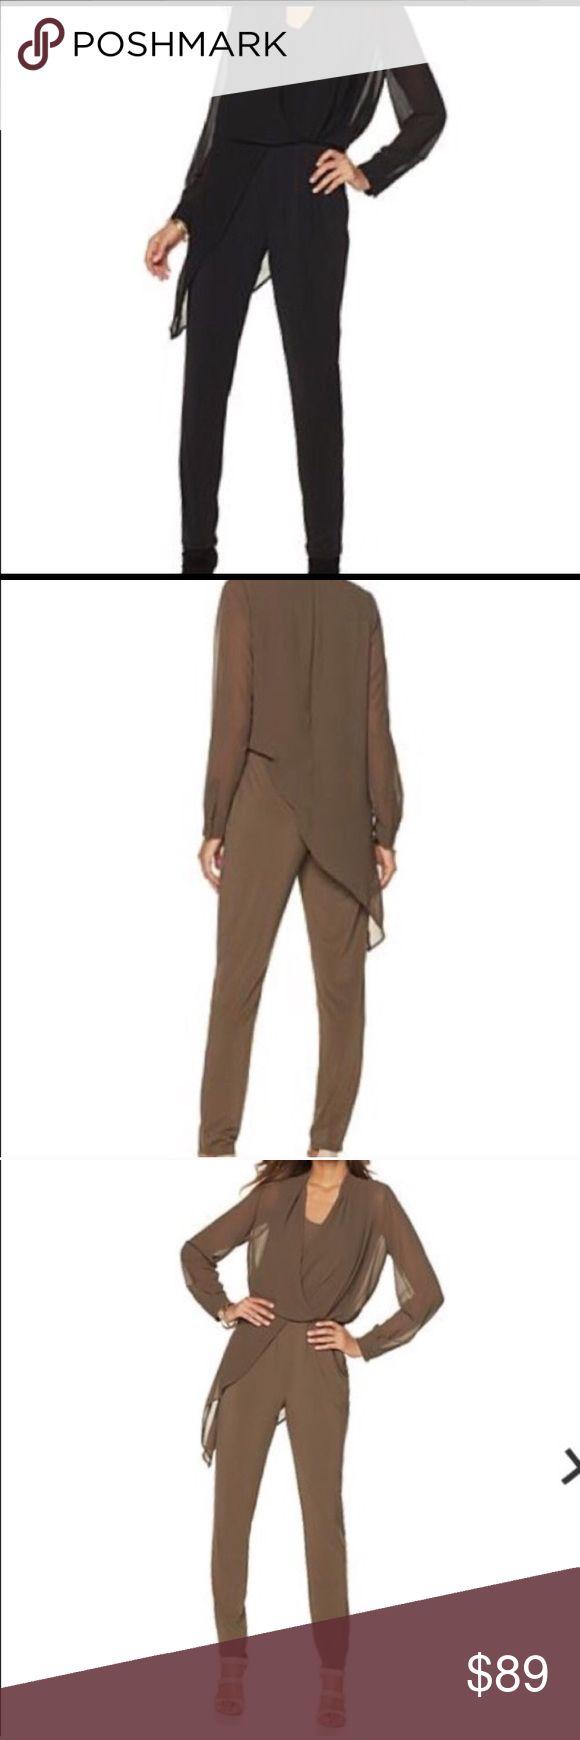 NeNe by NeNe Leakes Jumpsuit NeNe by NeNe Leakes Jumpsuit - BLACK. New. Never worn. (Pictures from HSN website to show what it looks like on) NeNe by NeNe Leakes Pants Jumpsuits & Rompers